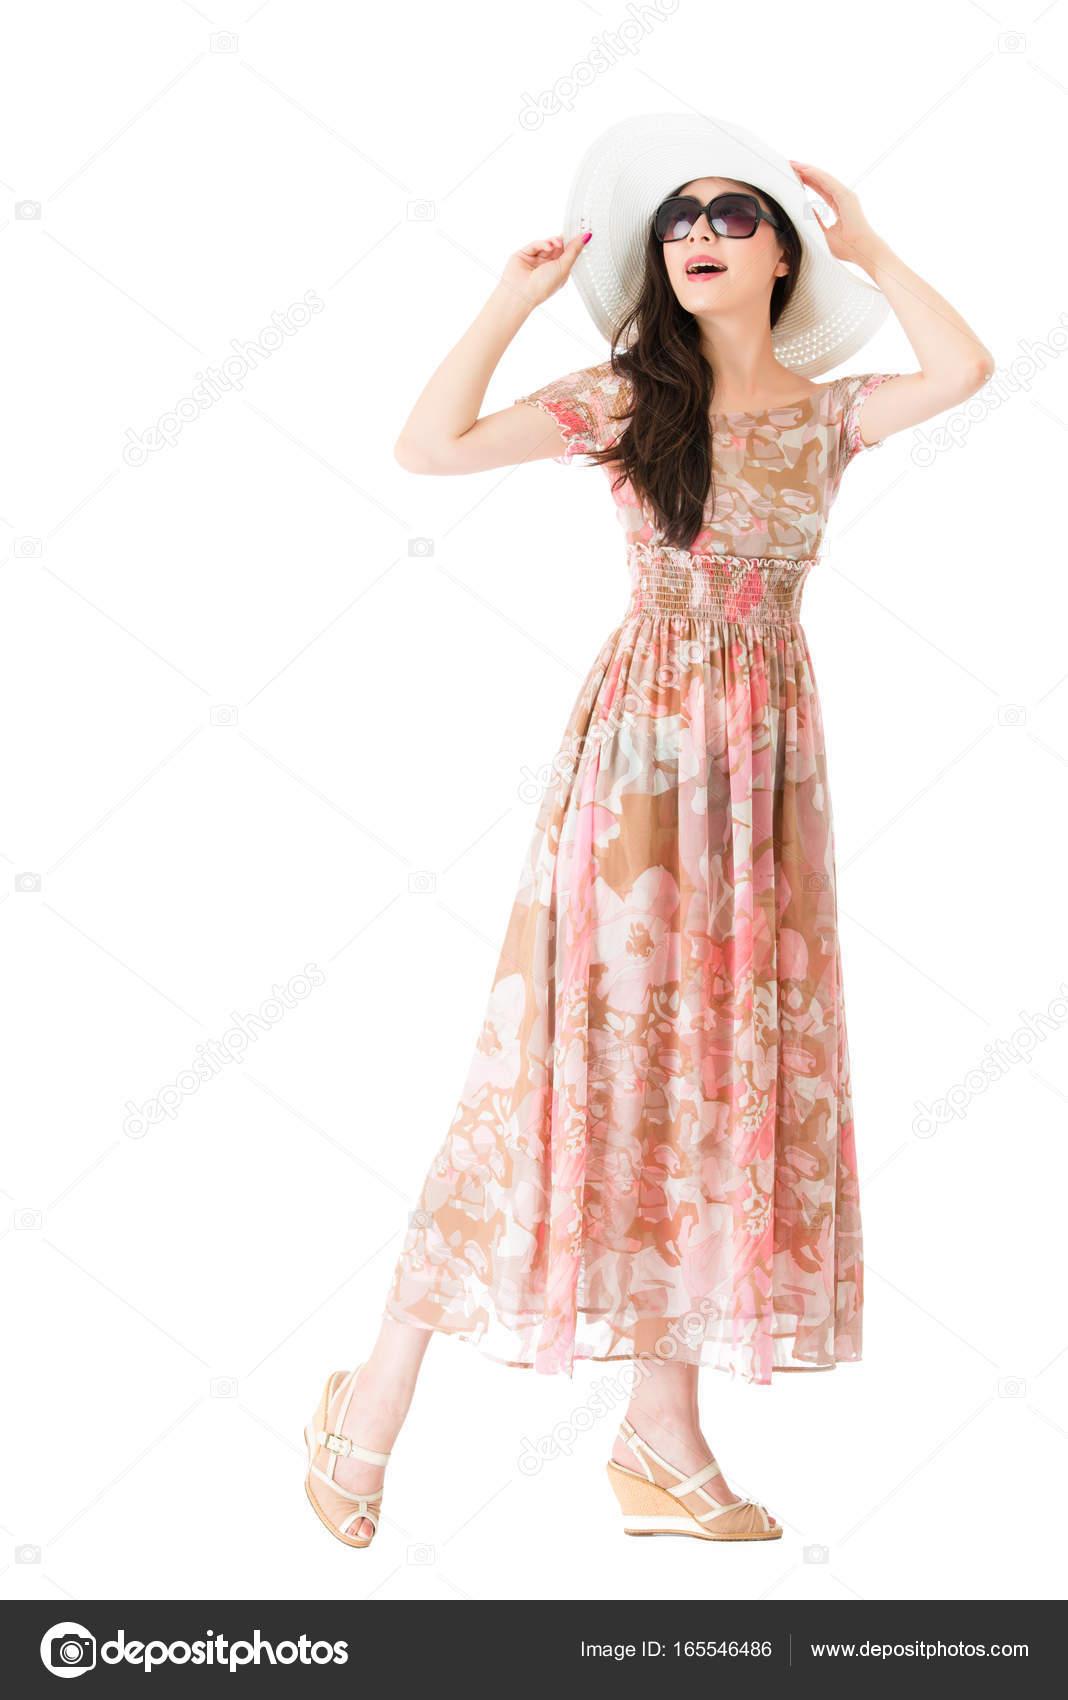 Zomer Kinderkleding.Elegantie Dragen Hoed Met Zomer Kinderkleding Jurk Stockfoto